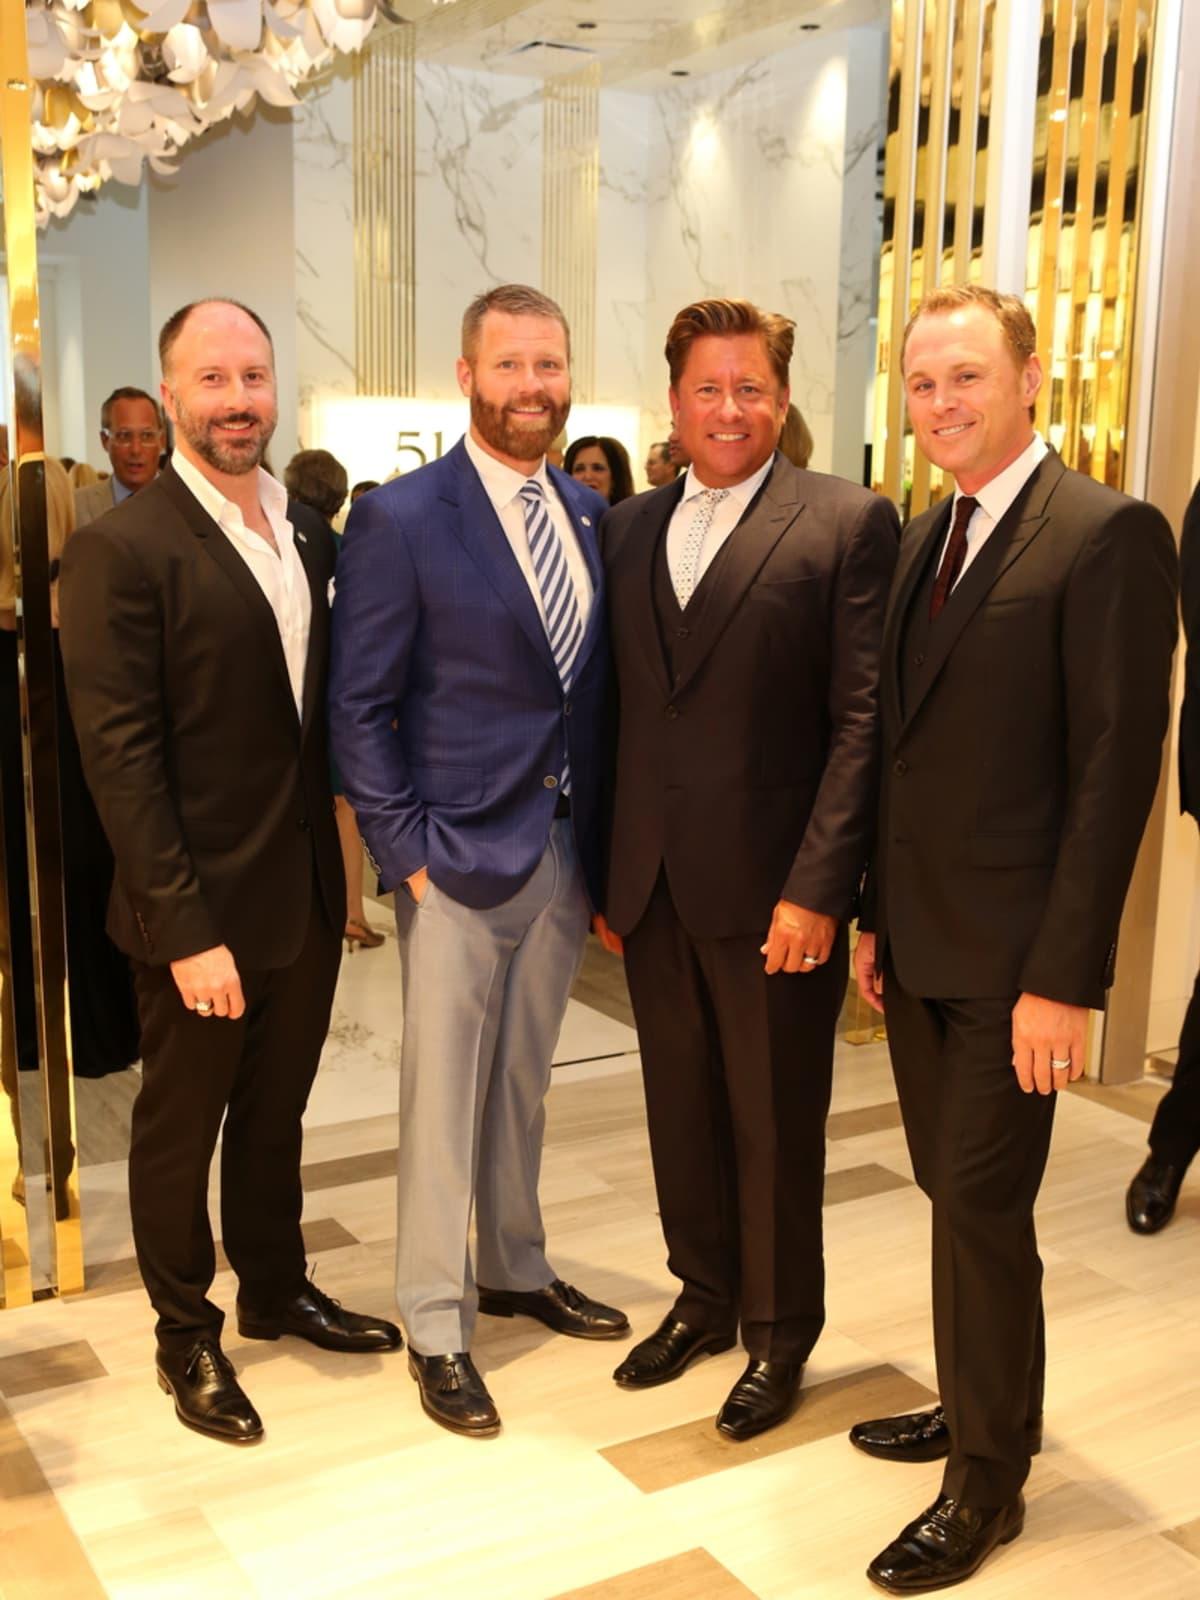 Saks Opening Dinner for HGO 4/16, Tony Bradfield, Kevin Black, Brian Teichman, Andrew Cordes